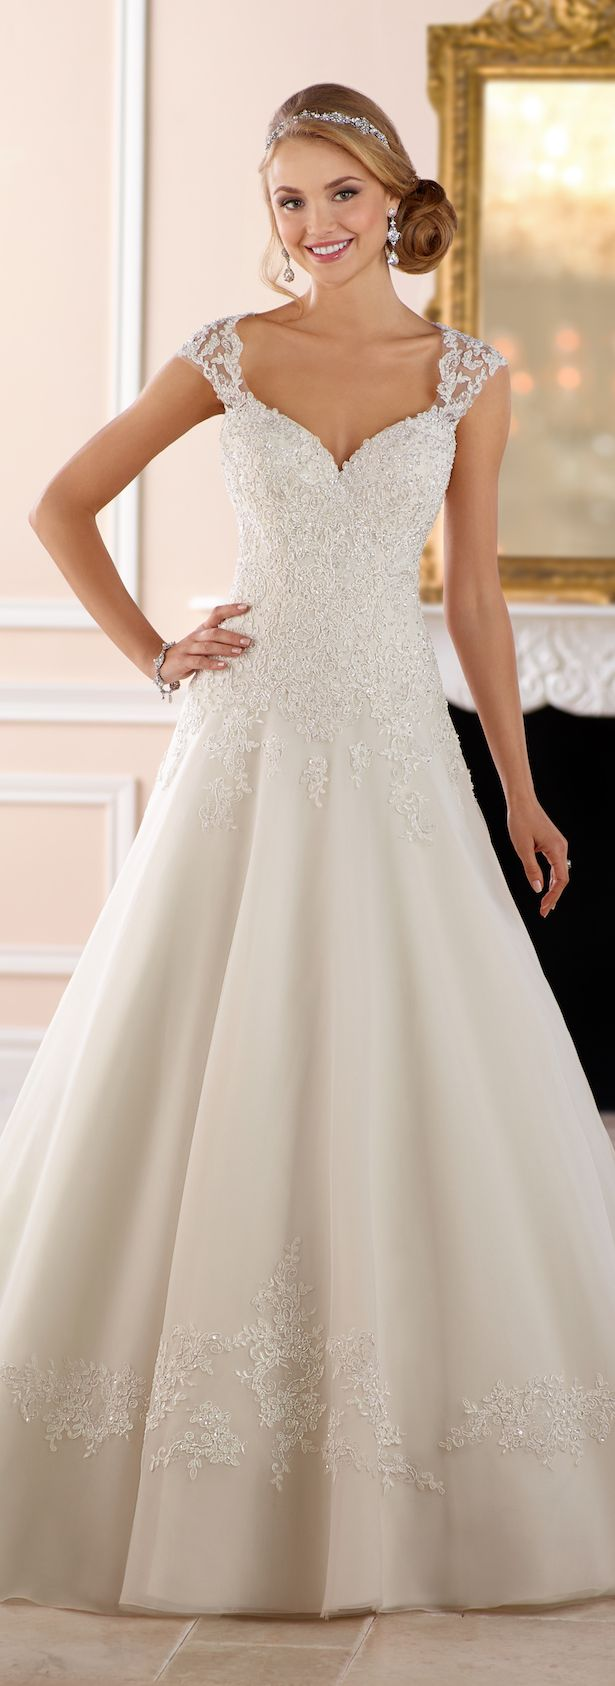 Wedding-Dresses-1189